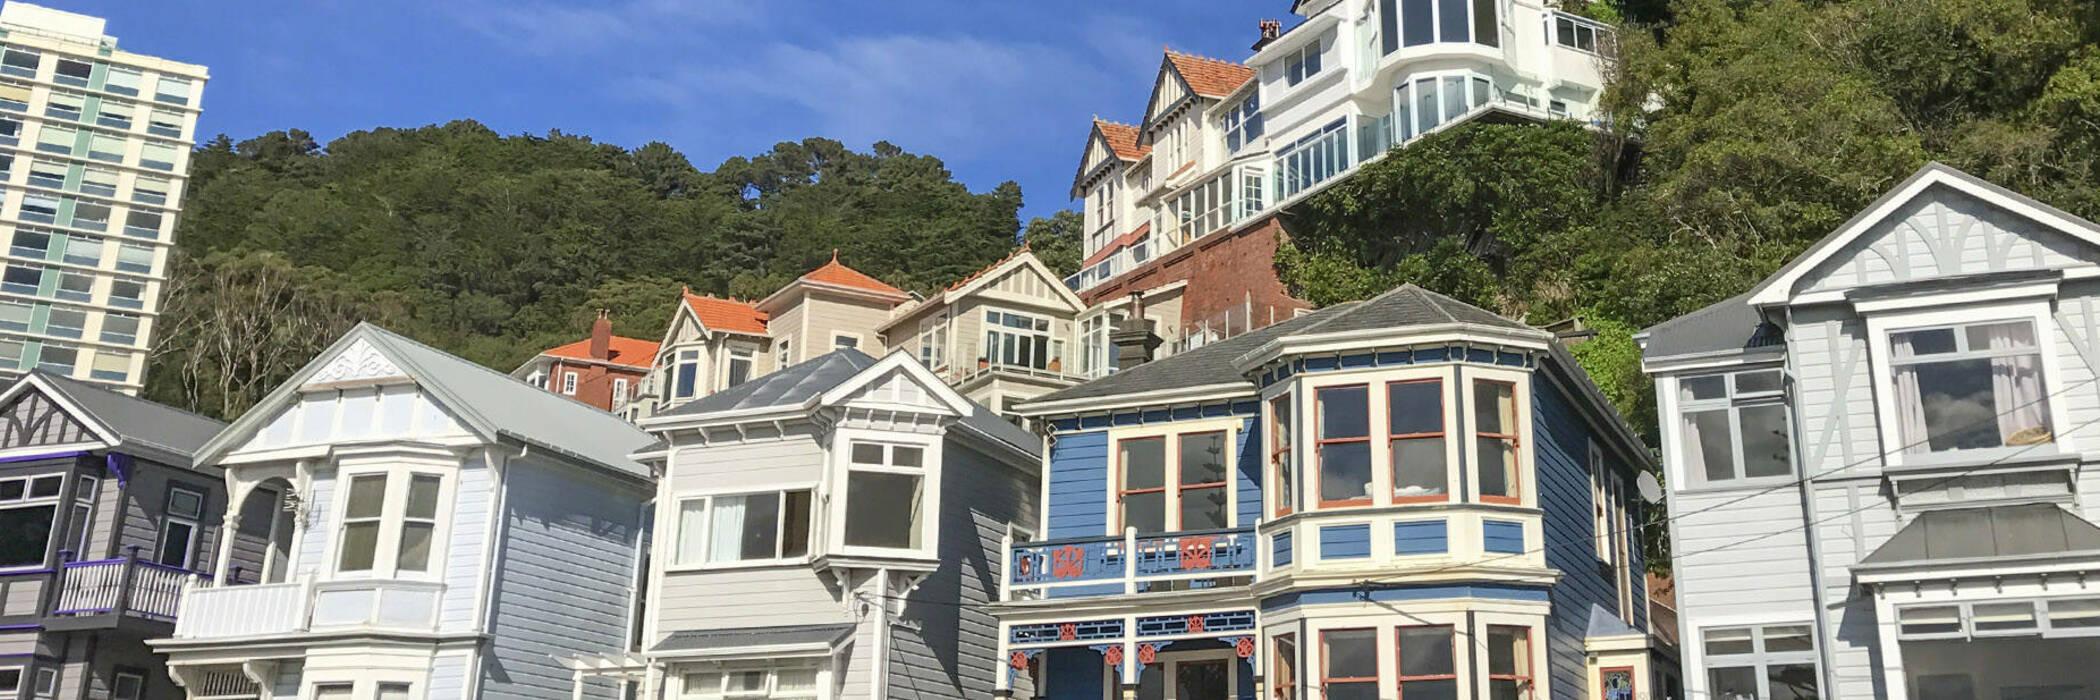 New Zealand houses